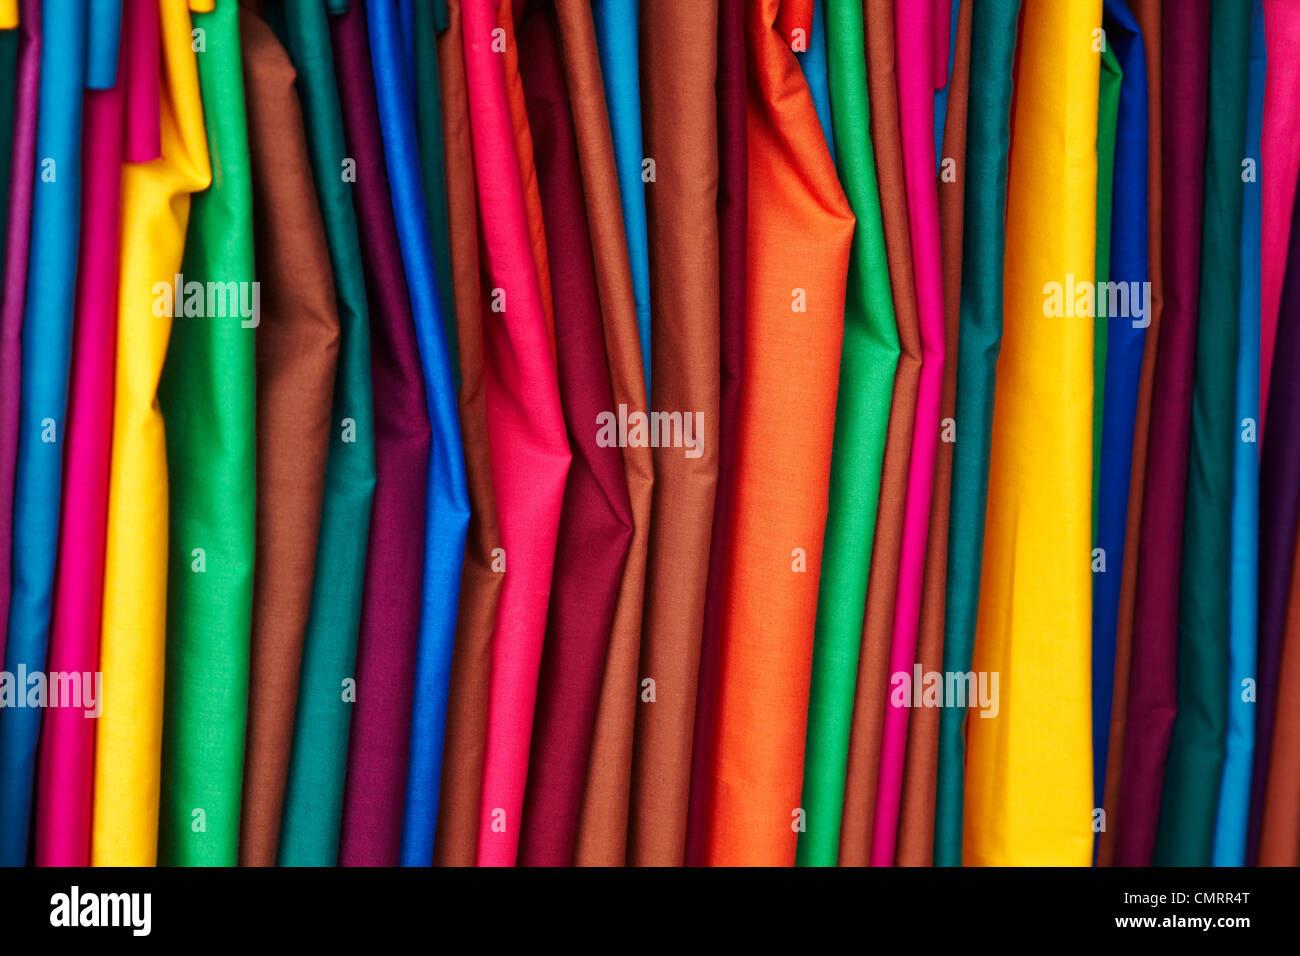 Material im Südpazifik, Viti Levu, Fidschi, Suva, Suva Flohmarkt in leuchtenden Farben Stockbild